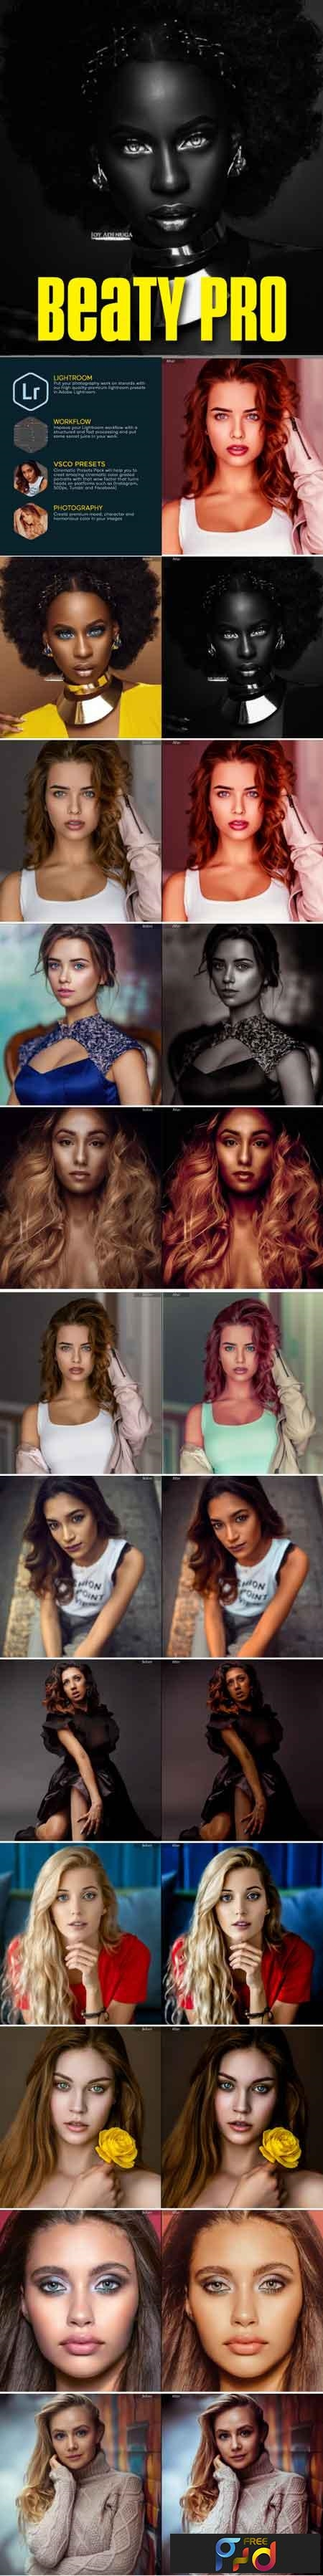 18 Beauty Skin Retouch Lightroom Presets 22603116 1